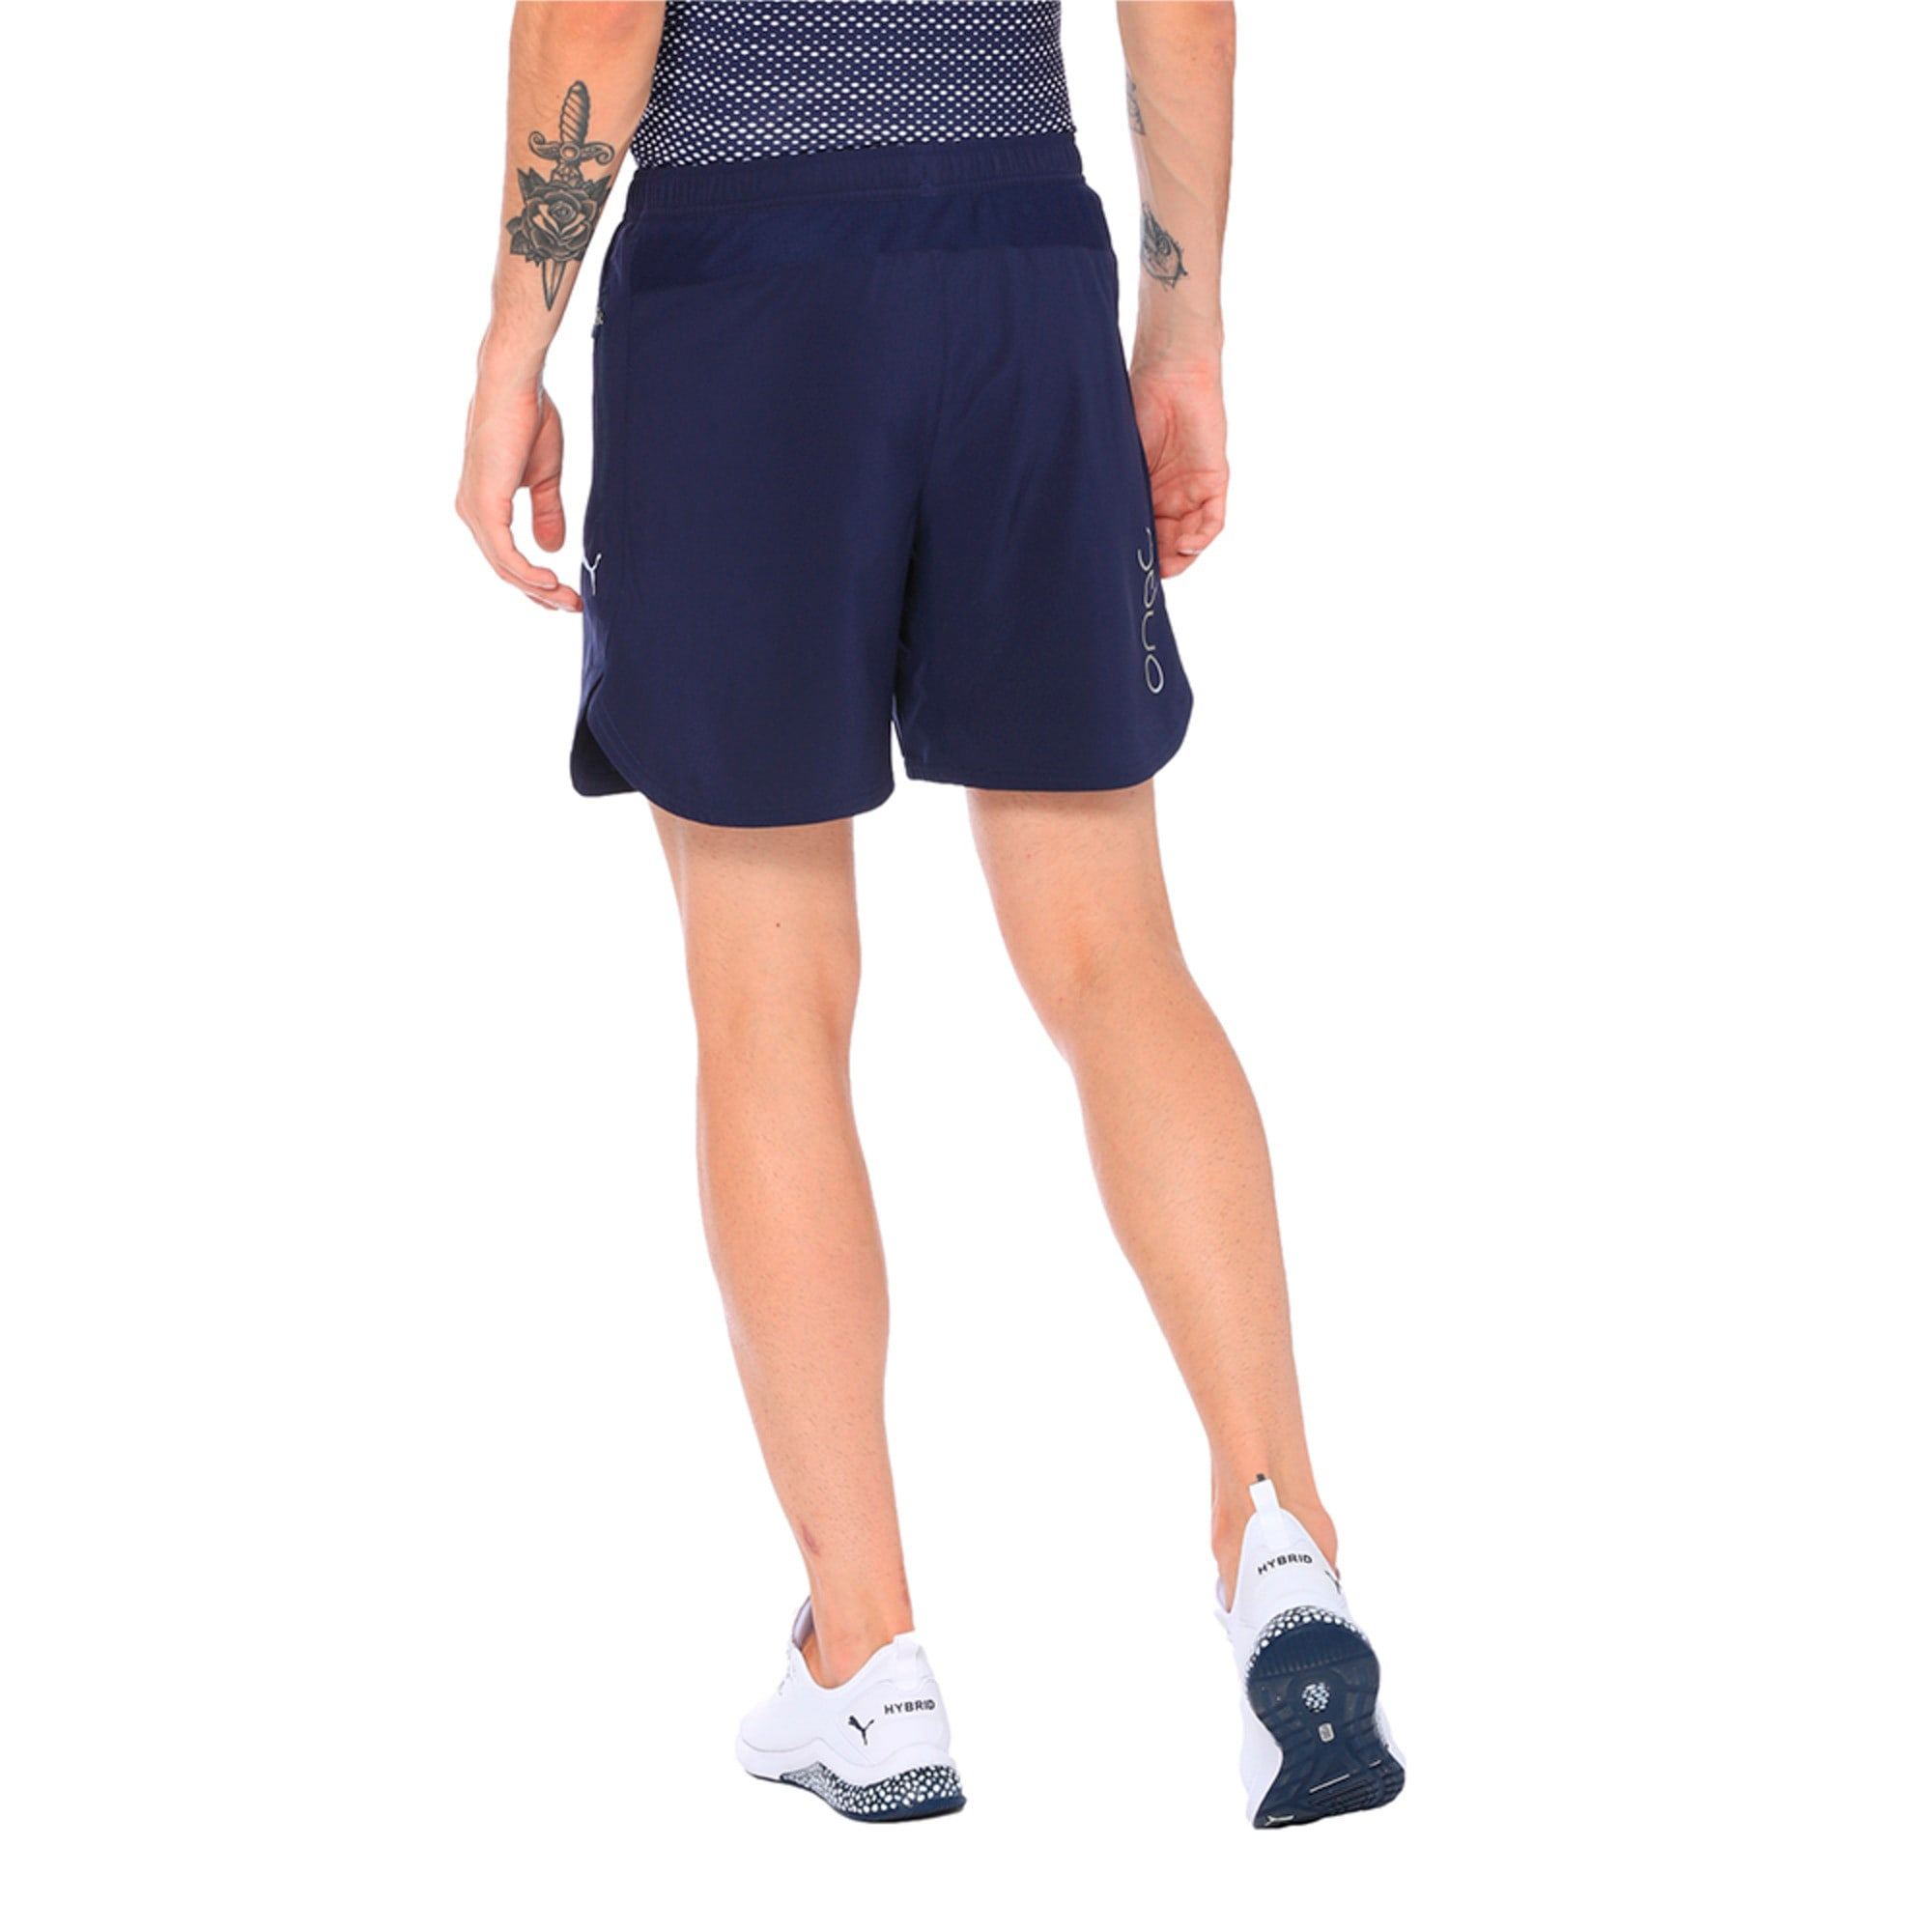 Thumbnail 5 of one8 VK Men's Active Shorts, Peacoat, medium-IND